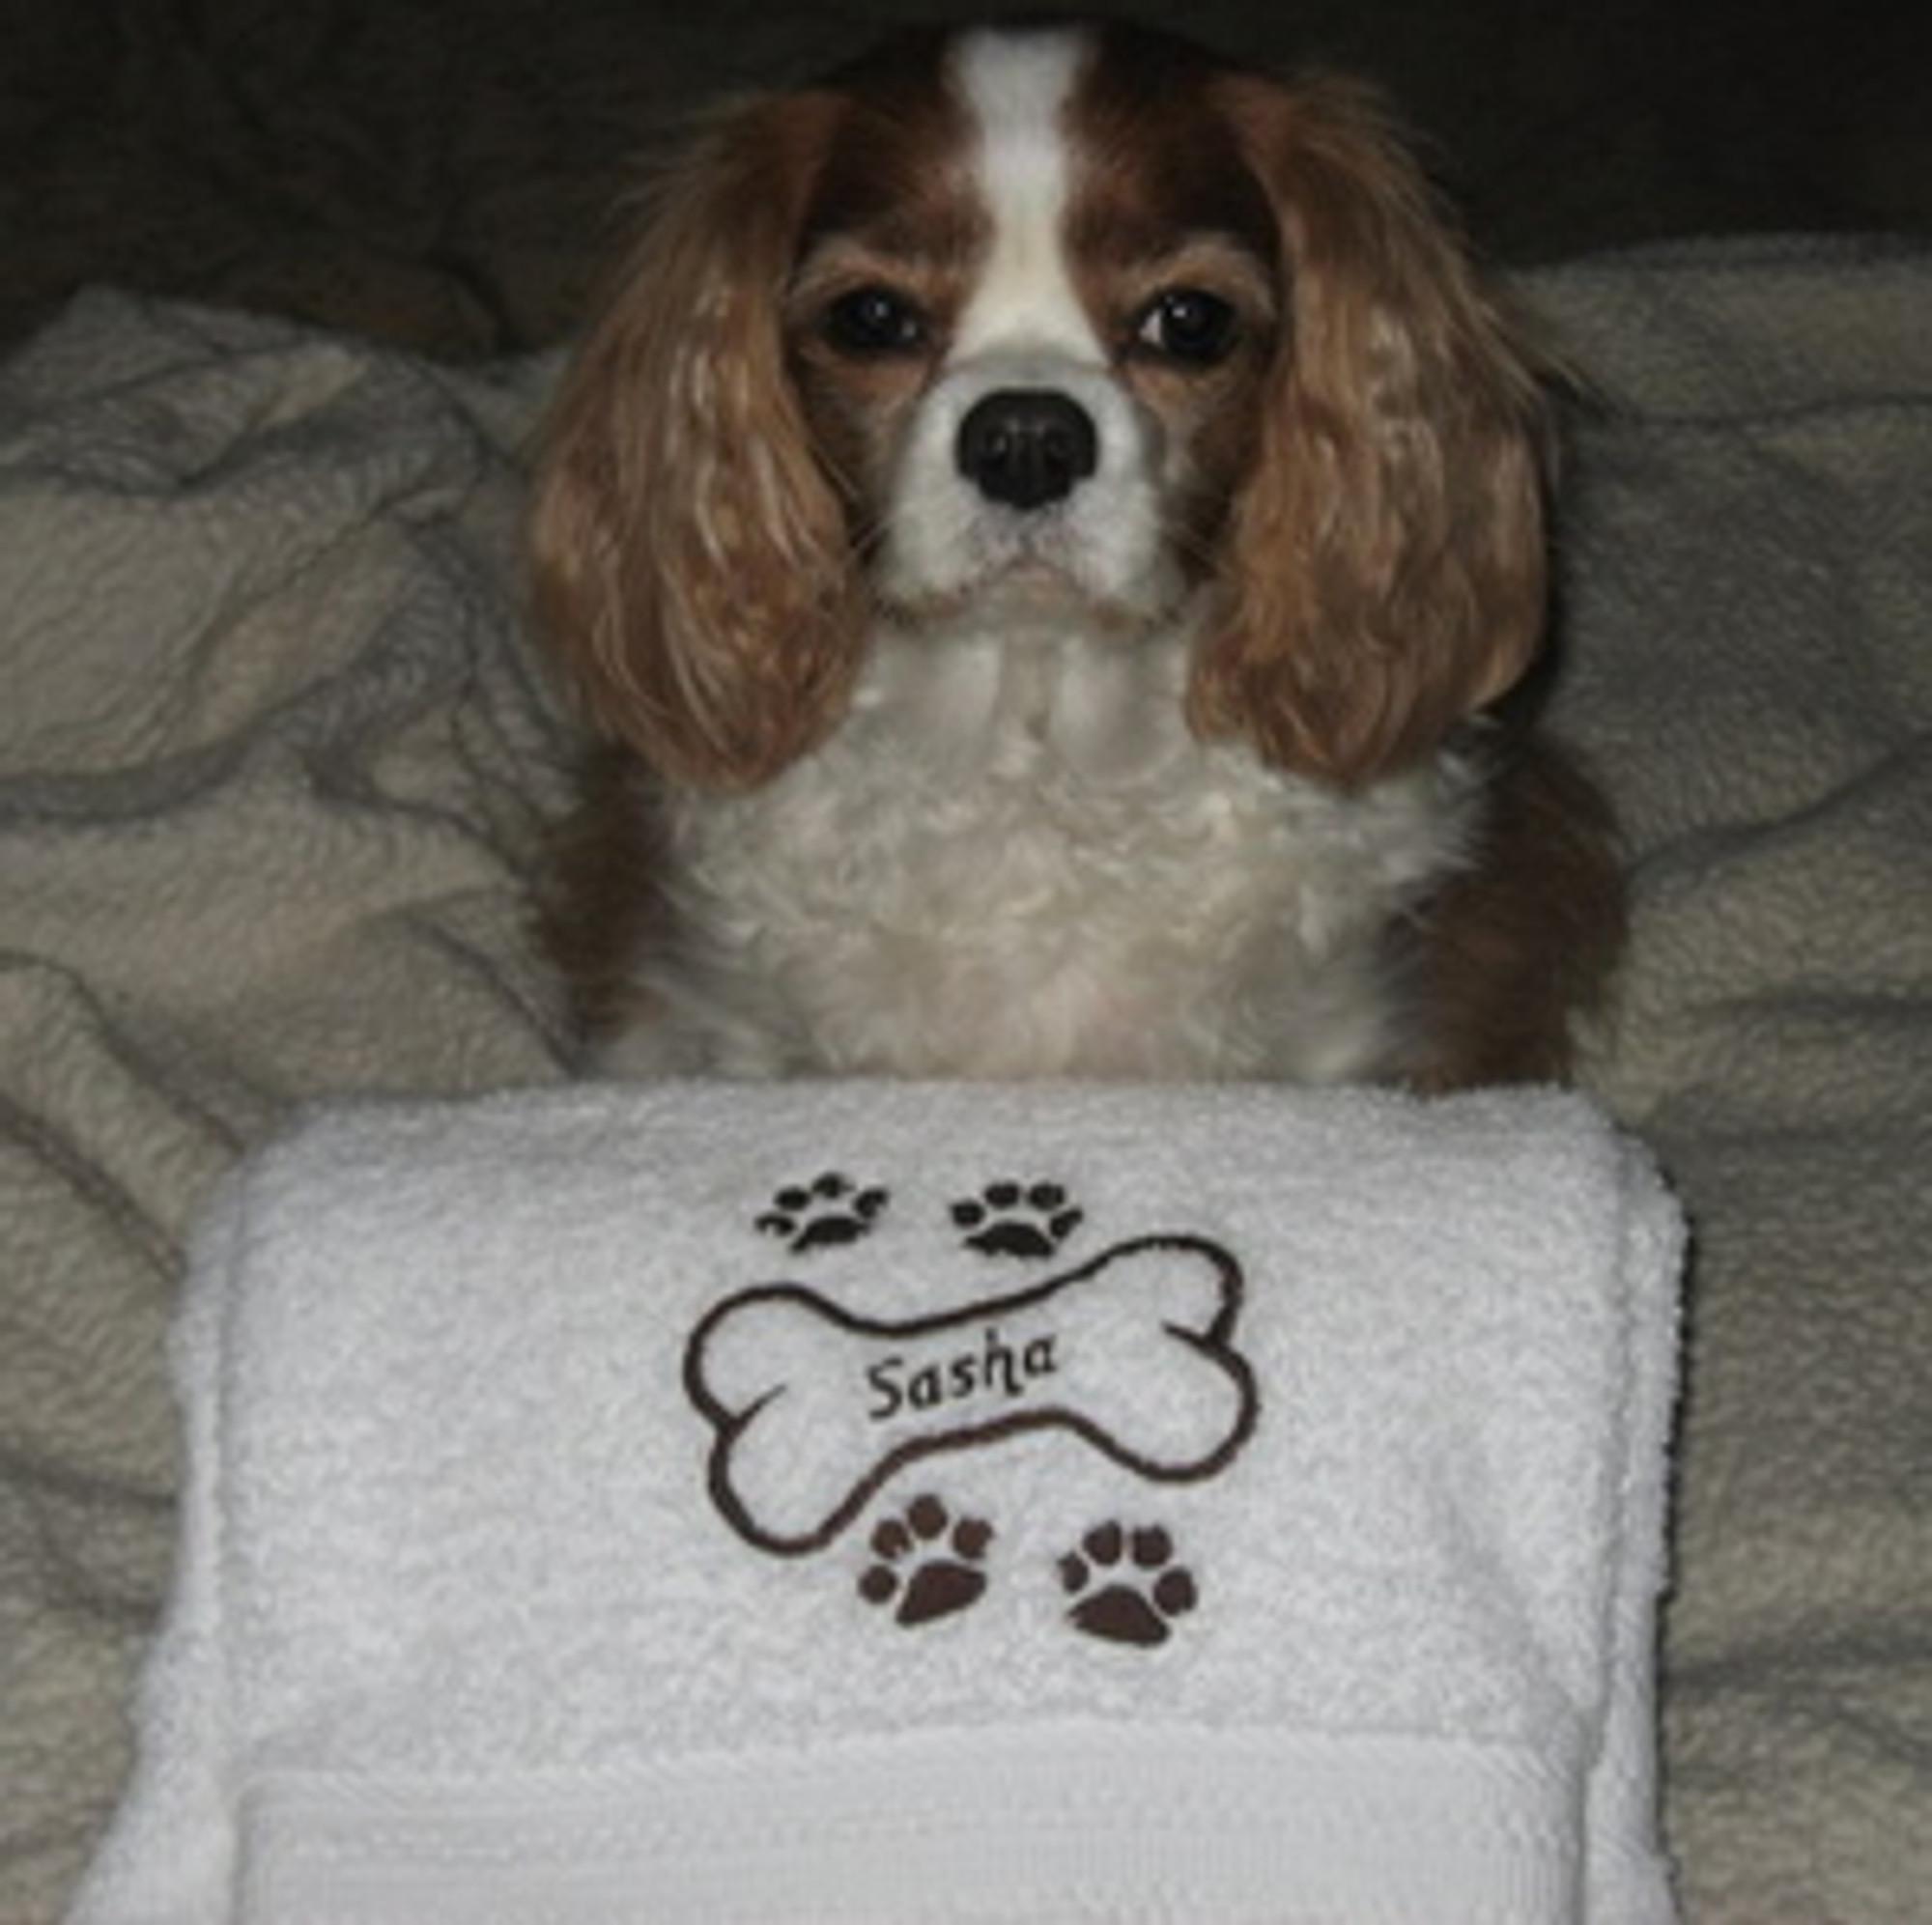 b935e8cd4e69 Dog Bath Towel - Plush Embroidered (personalized) - Paws Fur Treats